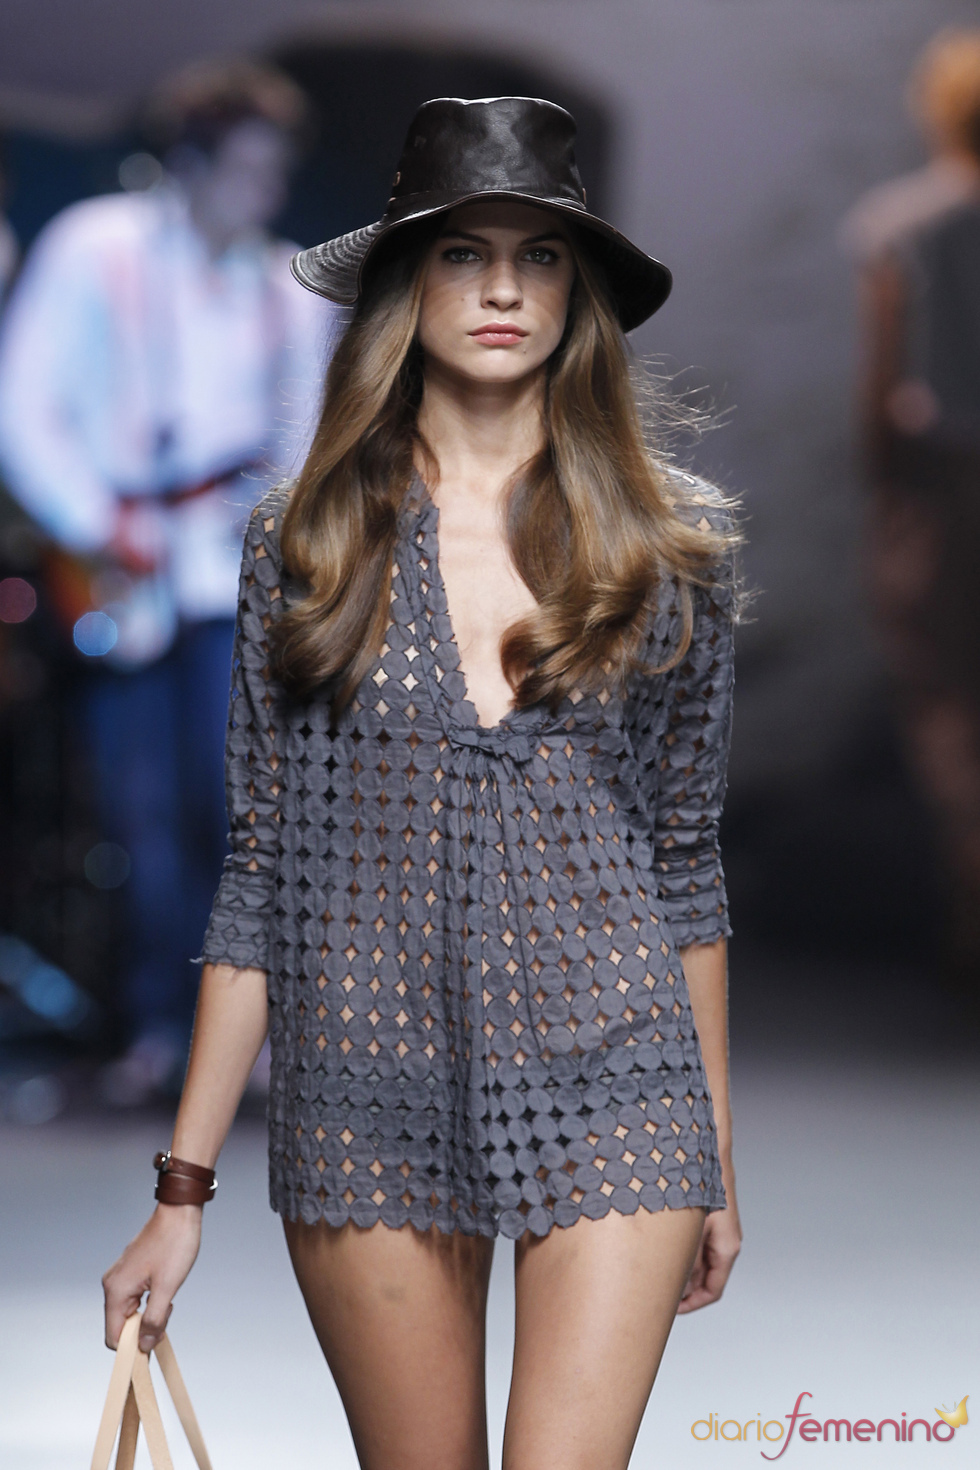 Holgadas blusas perforadas para ir a la playa segúnTCN en la Madrid Fashion Week